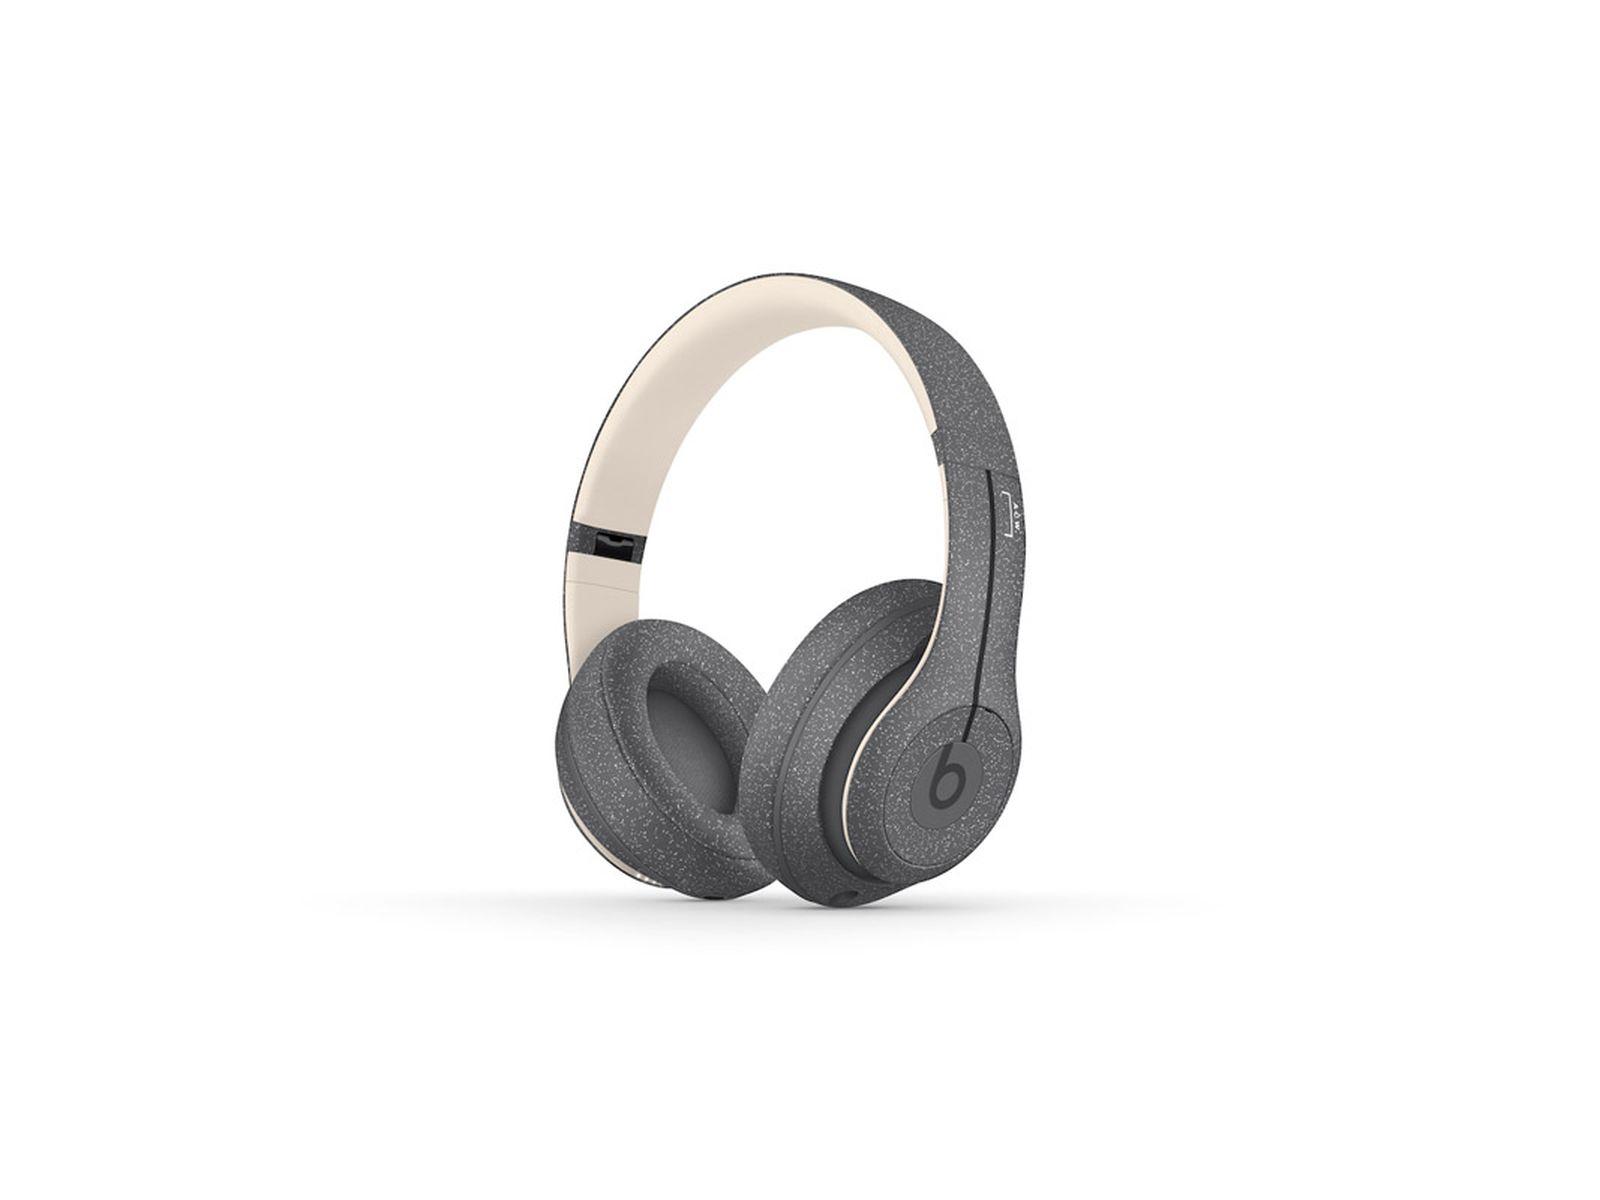 a-cold-wall-beats-headphones-release-info-06